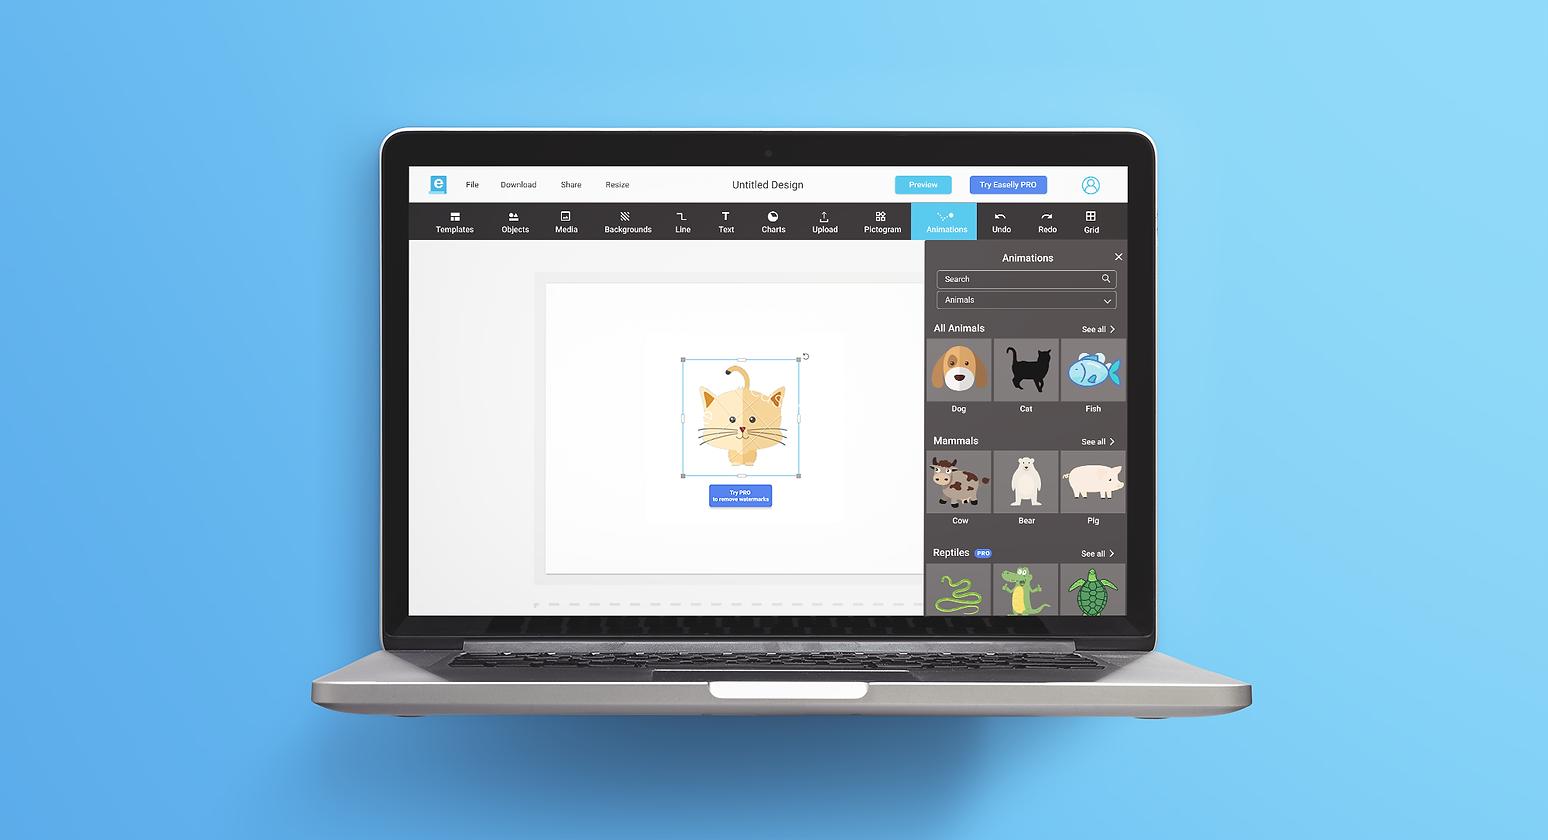 macbook-pro-2015-psd-mockup 02.png